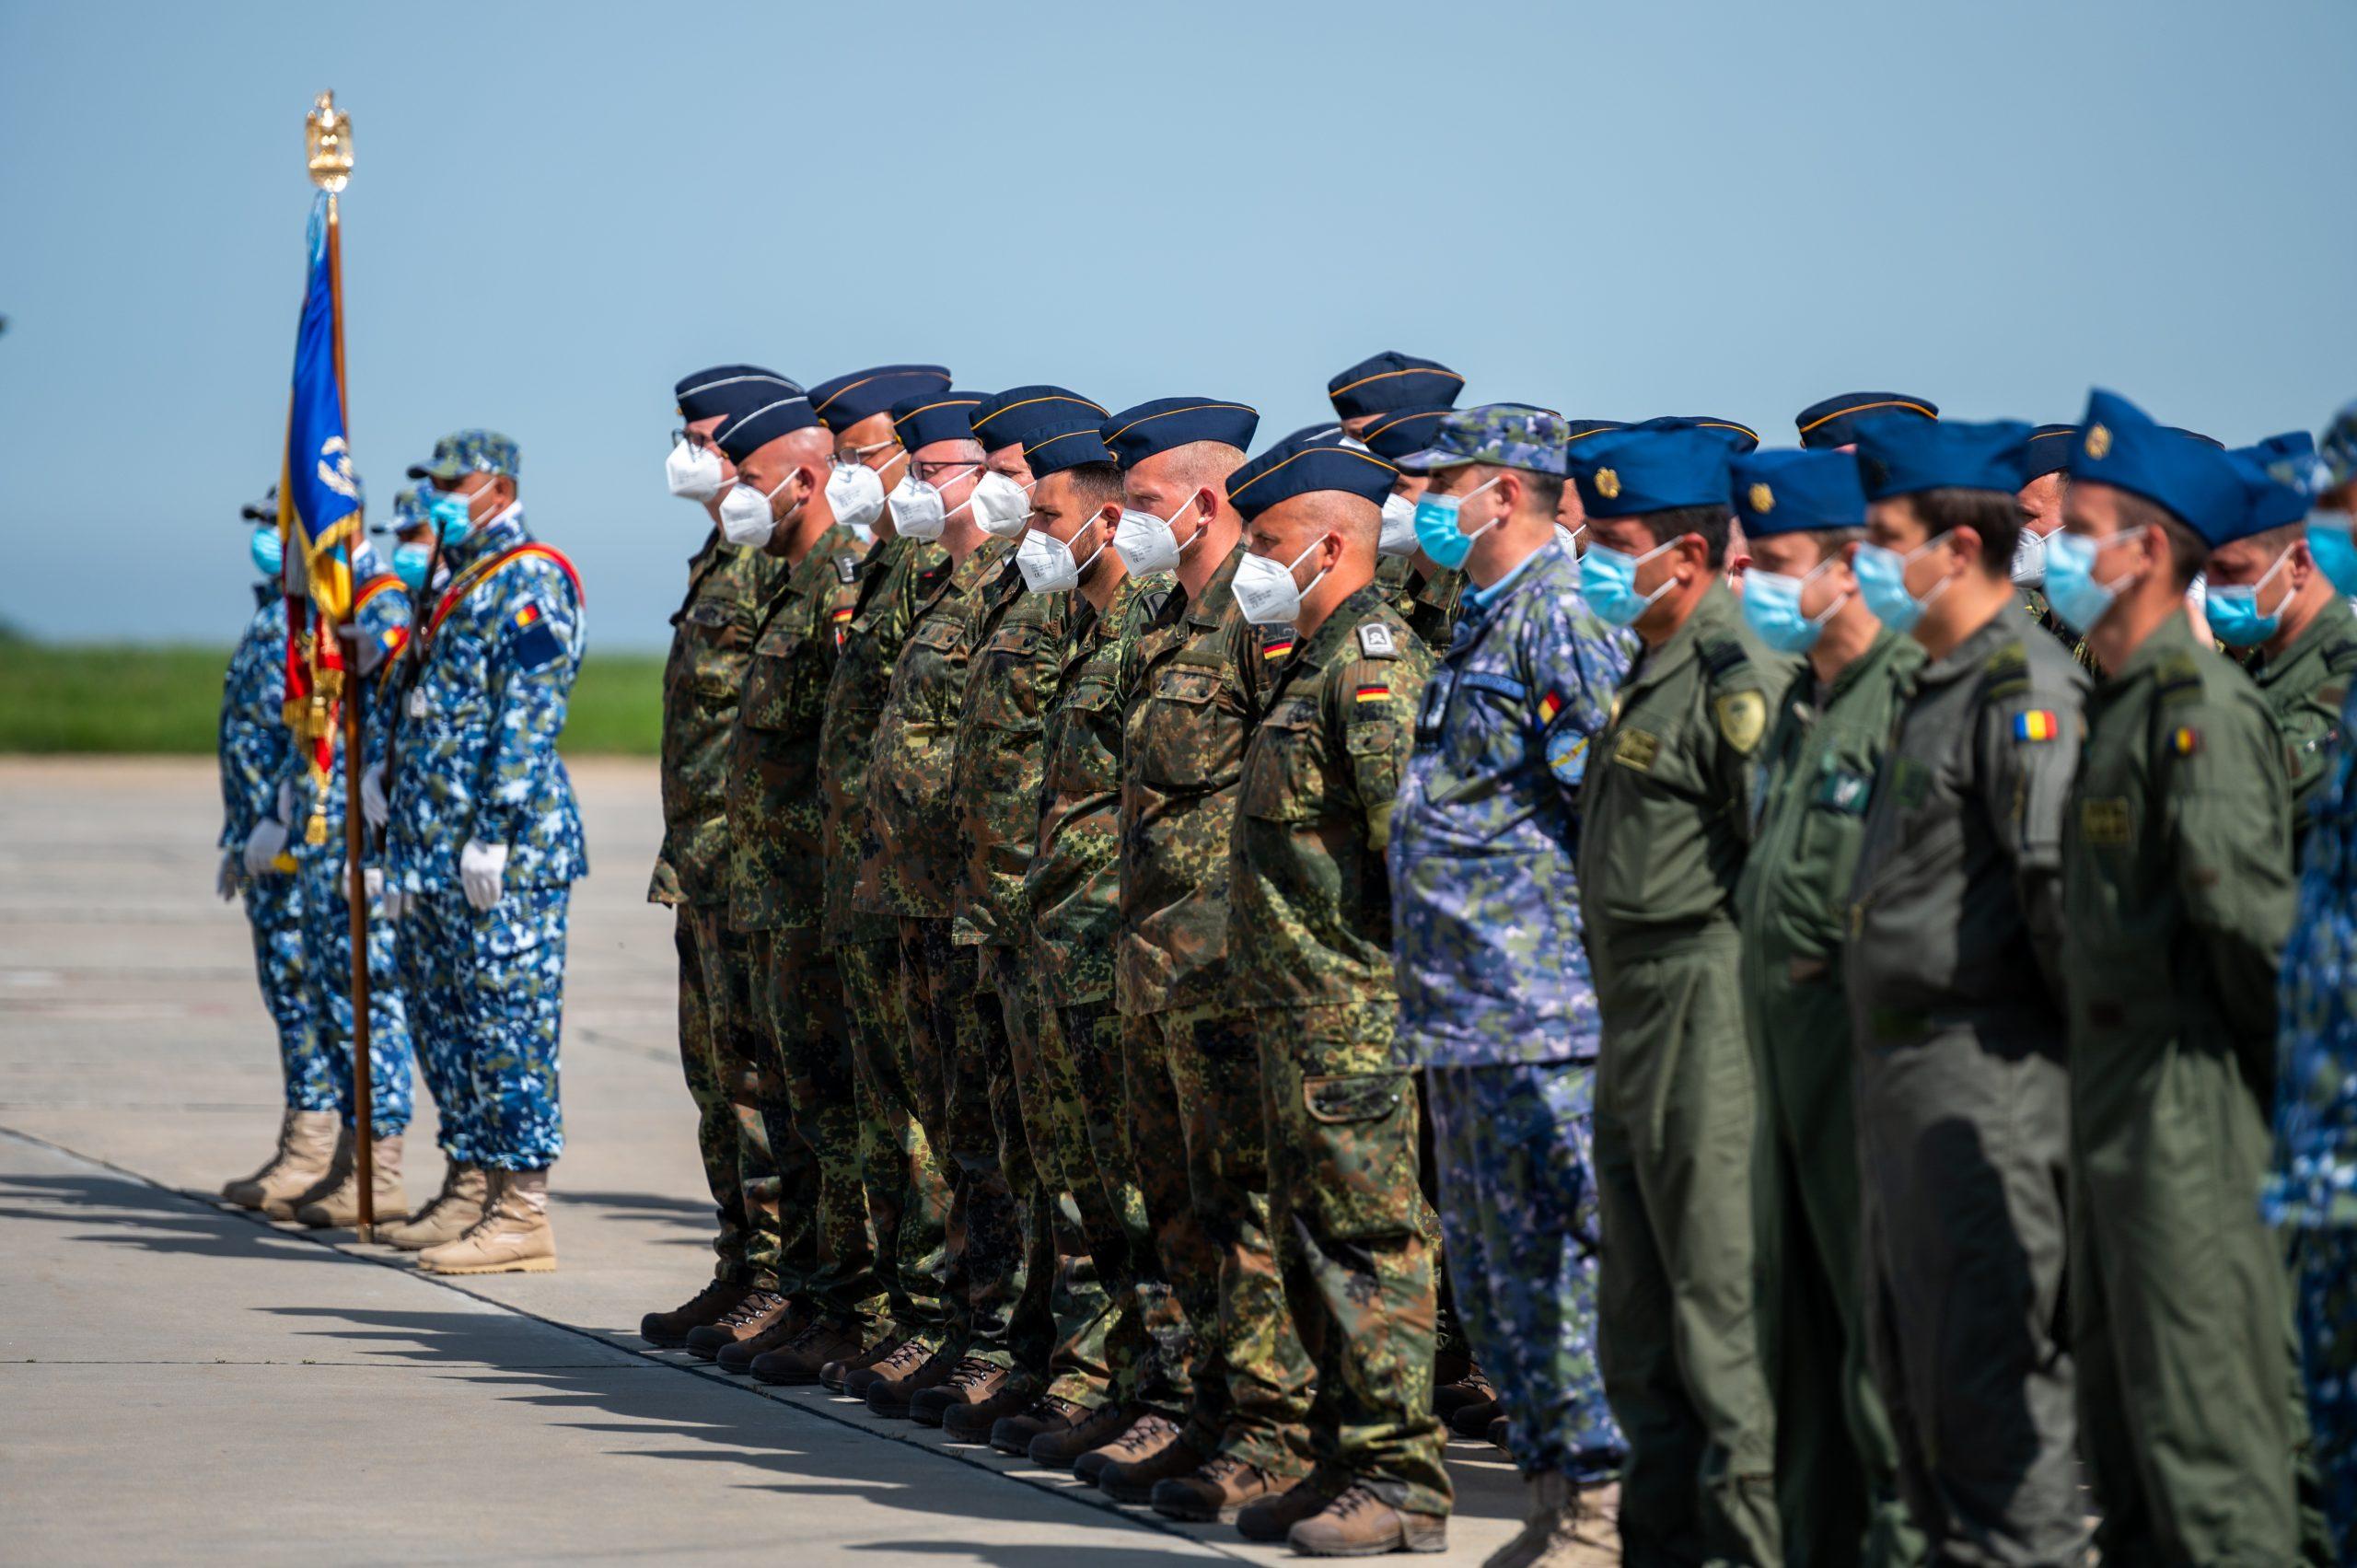 2021 07 01T151201Z 1625152379 DPAF210701X99X223693 RTRFIPP 4 DEFENSE NATO GERMANY ROMANIA UNITED KINGDOM scaled.